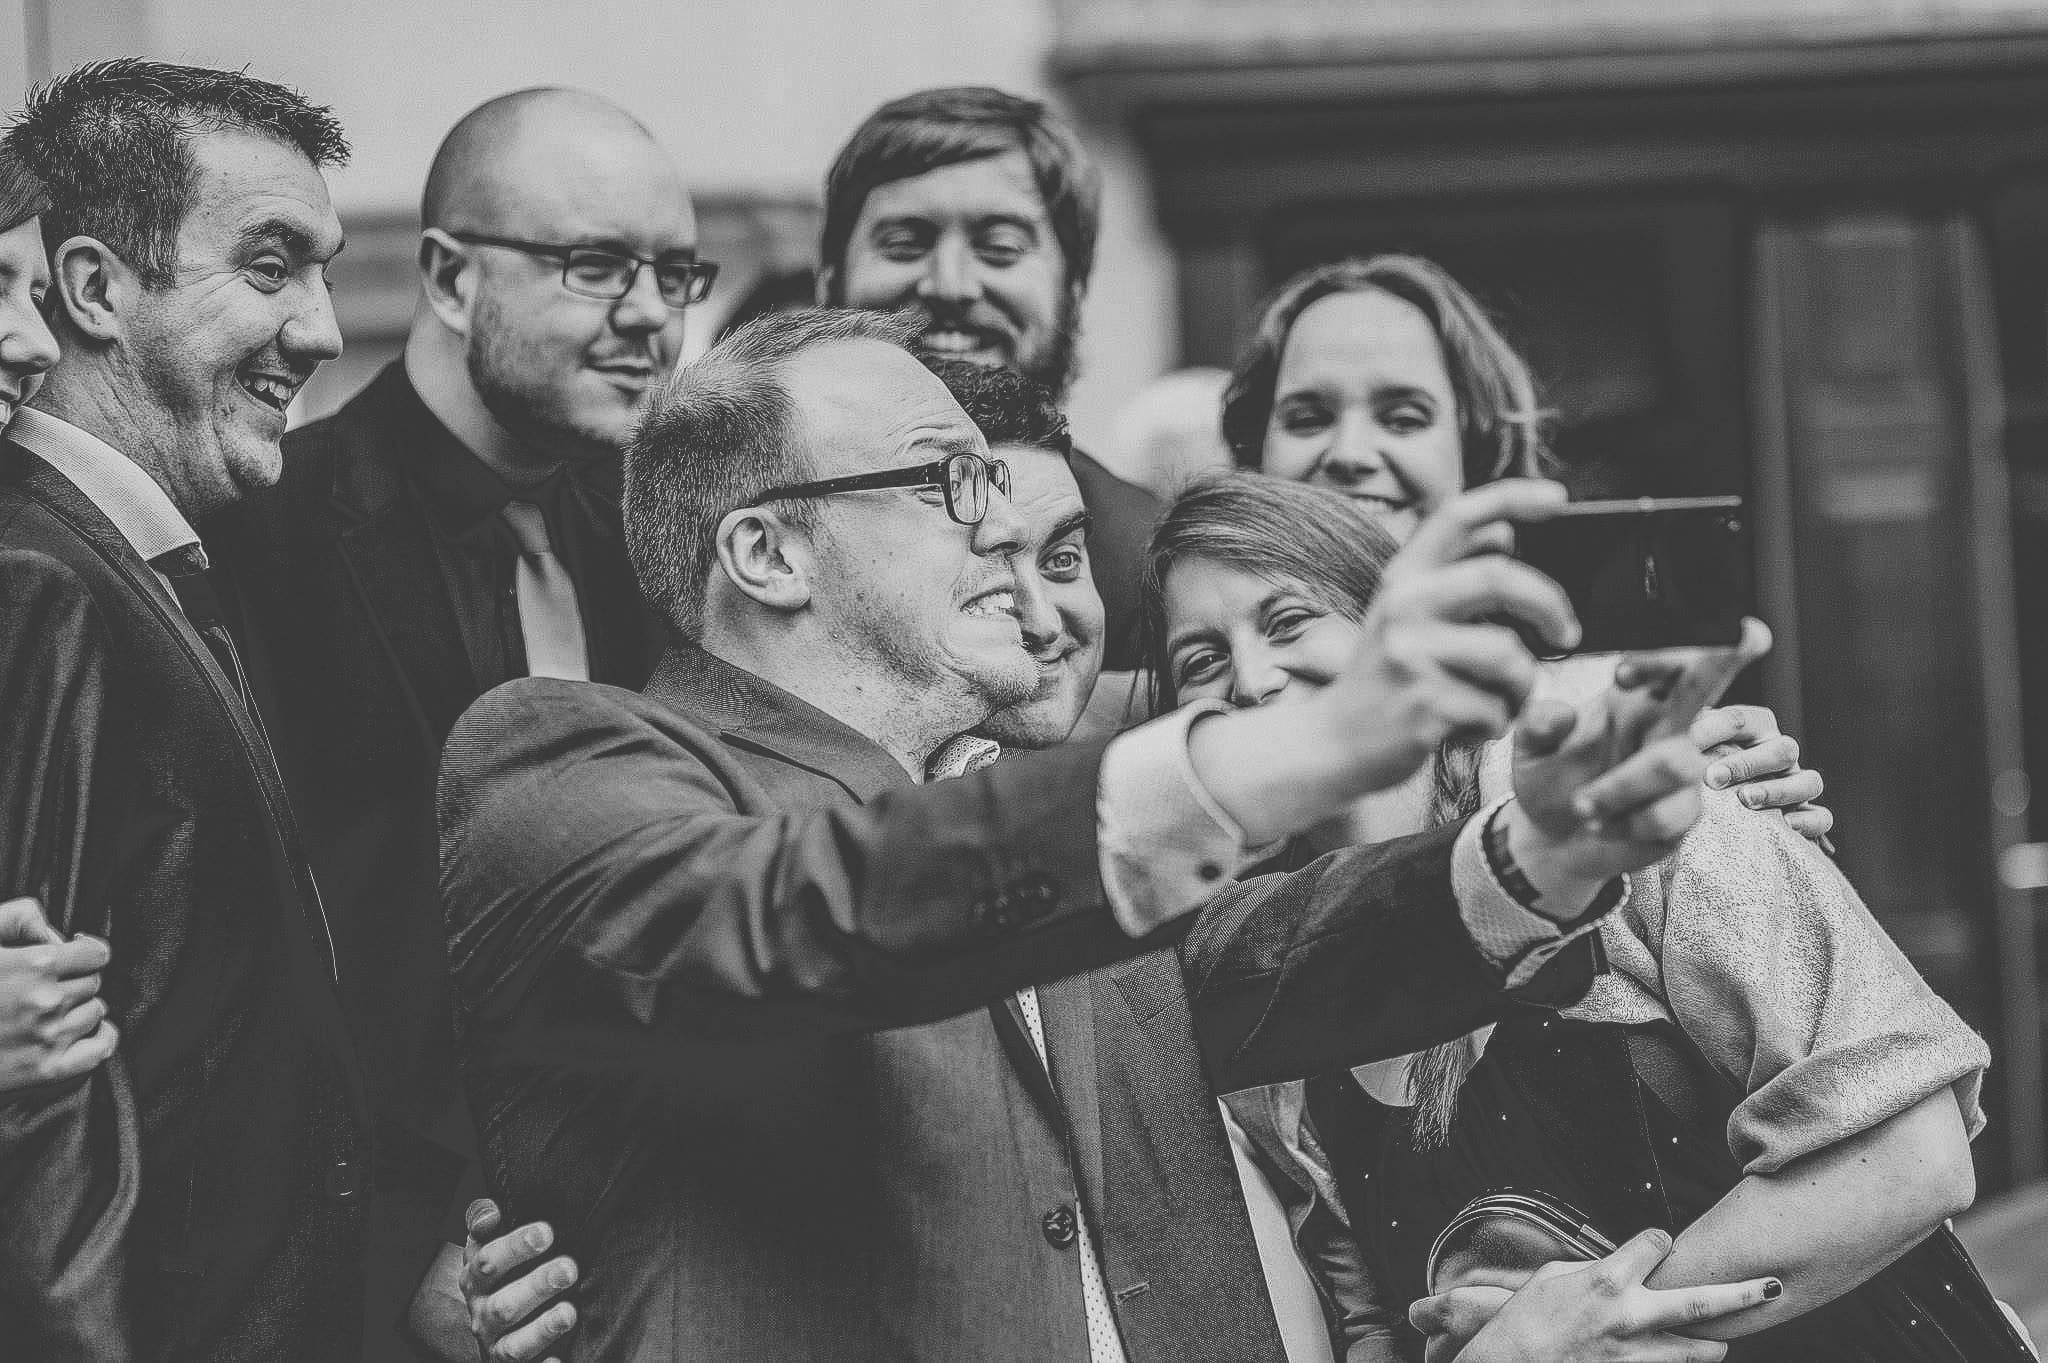 wedding photography midlands 95 - Midlands wedding photography - 2015 Review